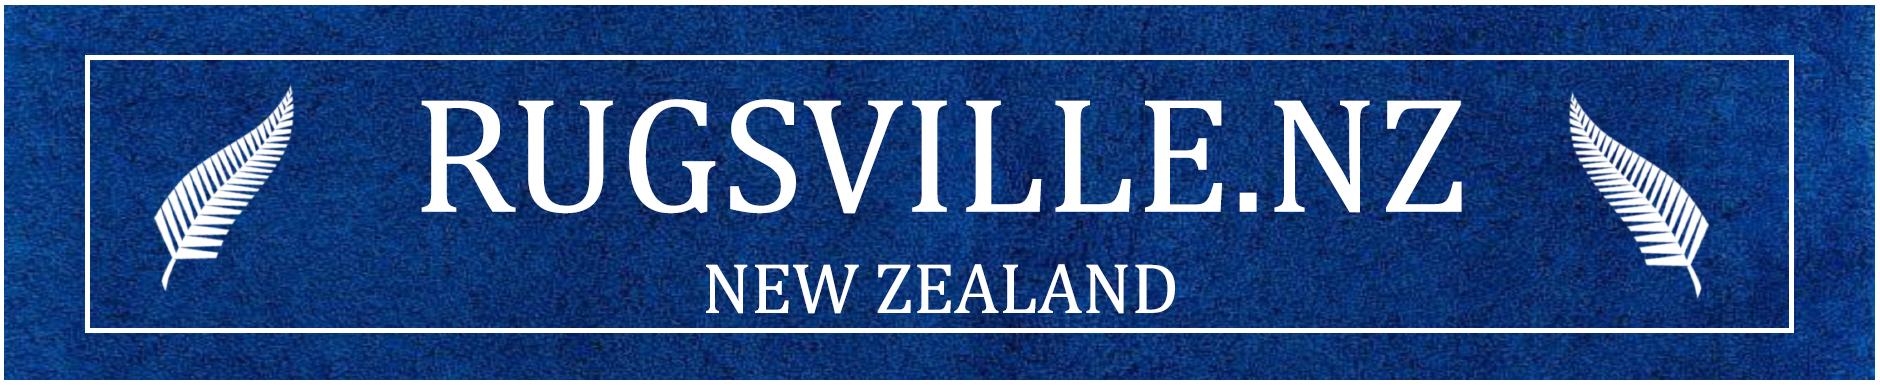 Rugsville NZ - Home Design & Decor Tips